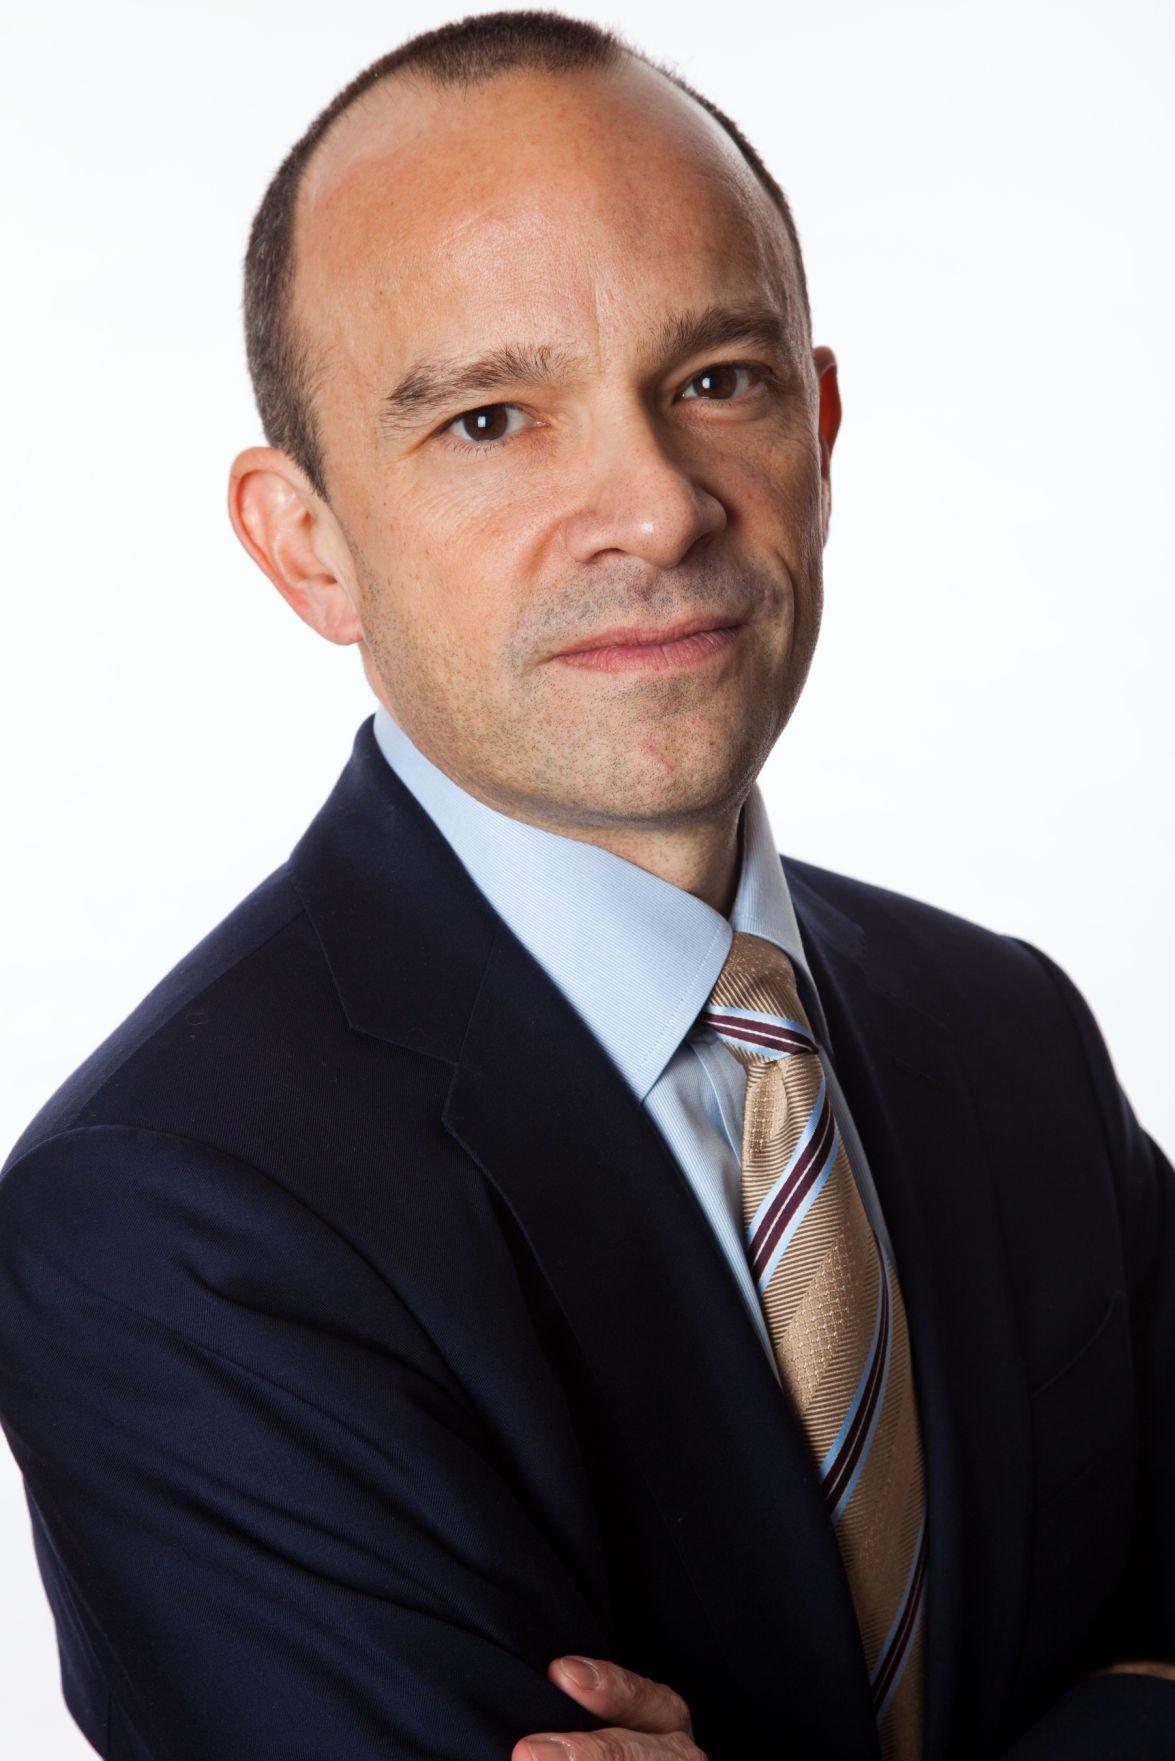 Larry Botel, managing partner of JOSS Realty Partners